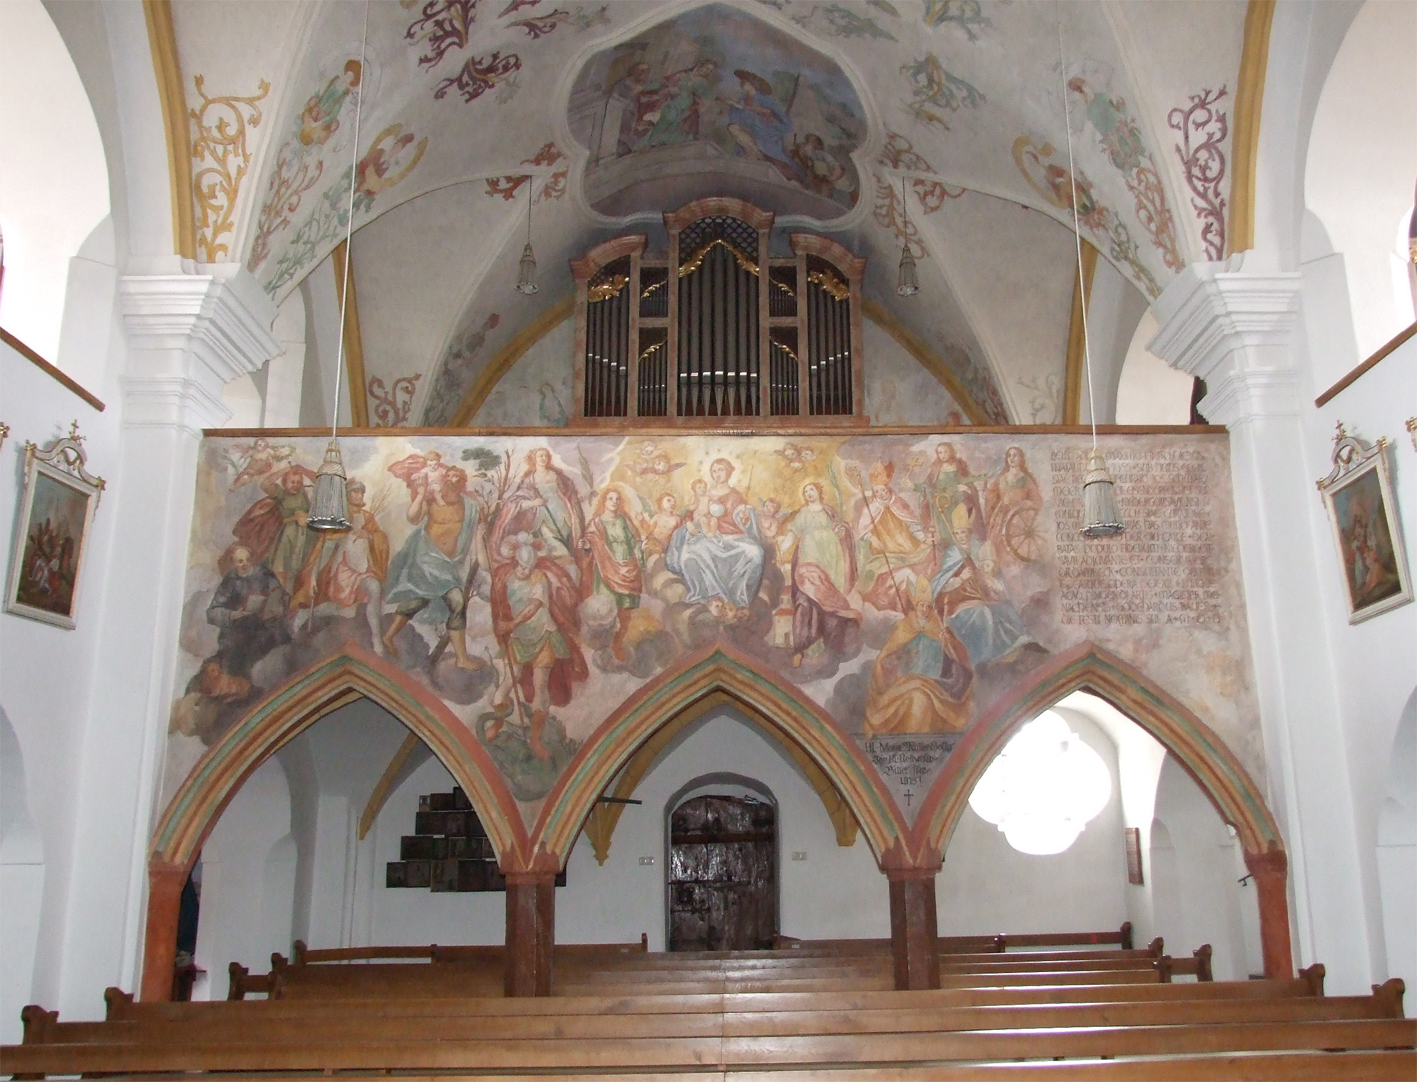 2021 05 17 aoelfb niedergottsau kirche mariae himmelfahrt orgelempore